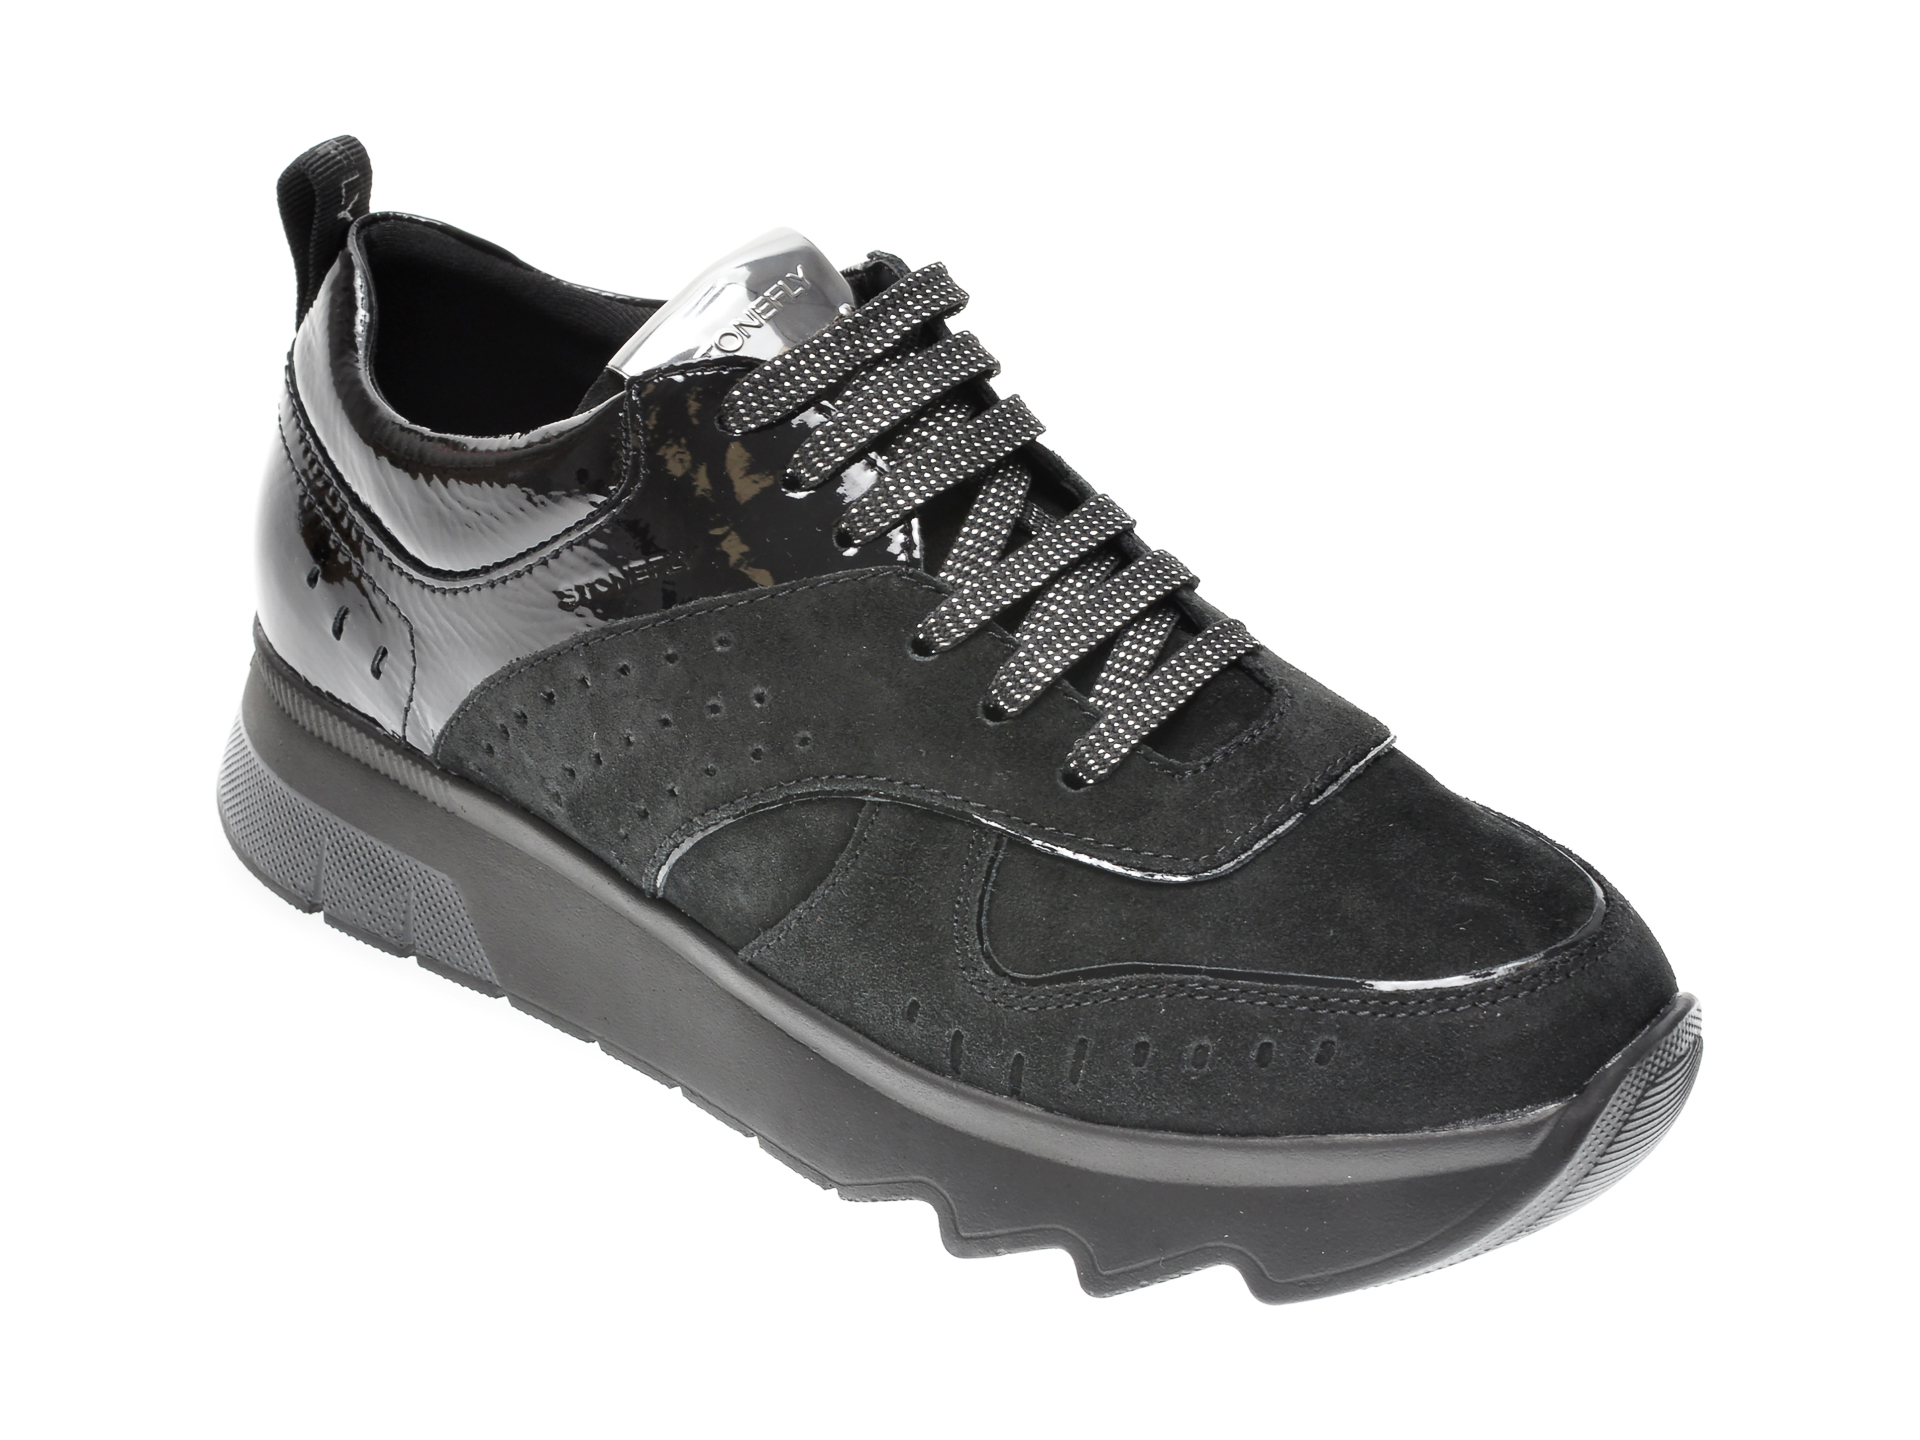 Pantofi STONEFLY negri, CREAM21, din piele intoarsa